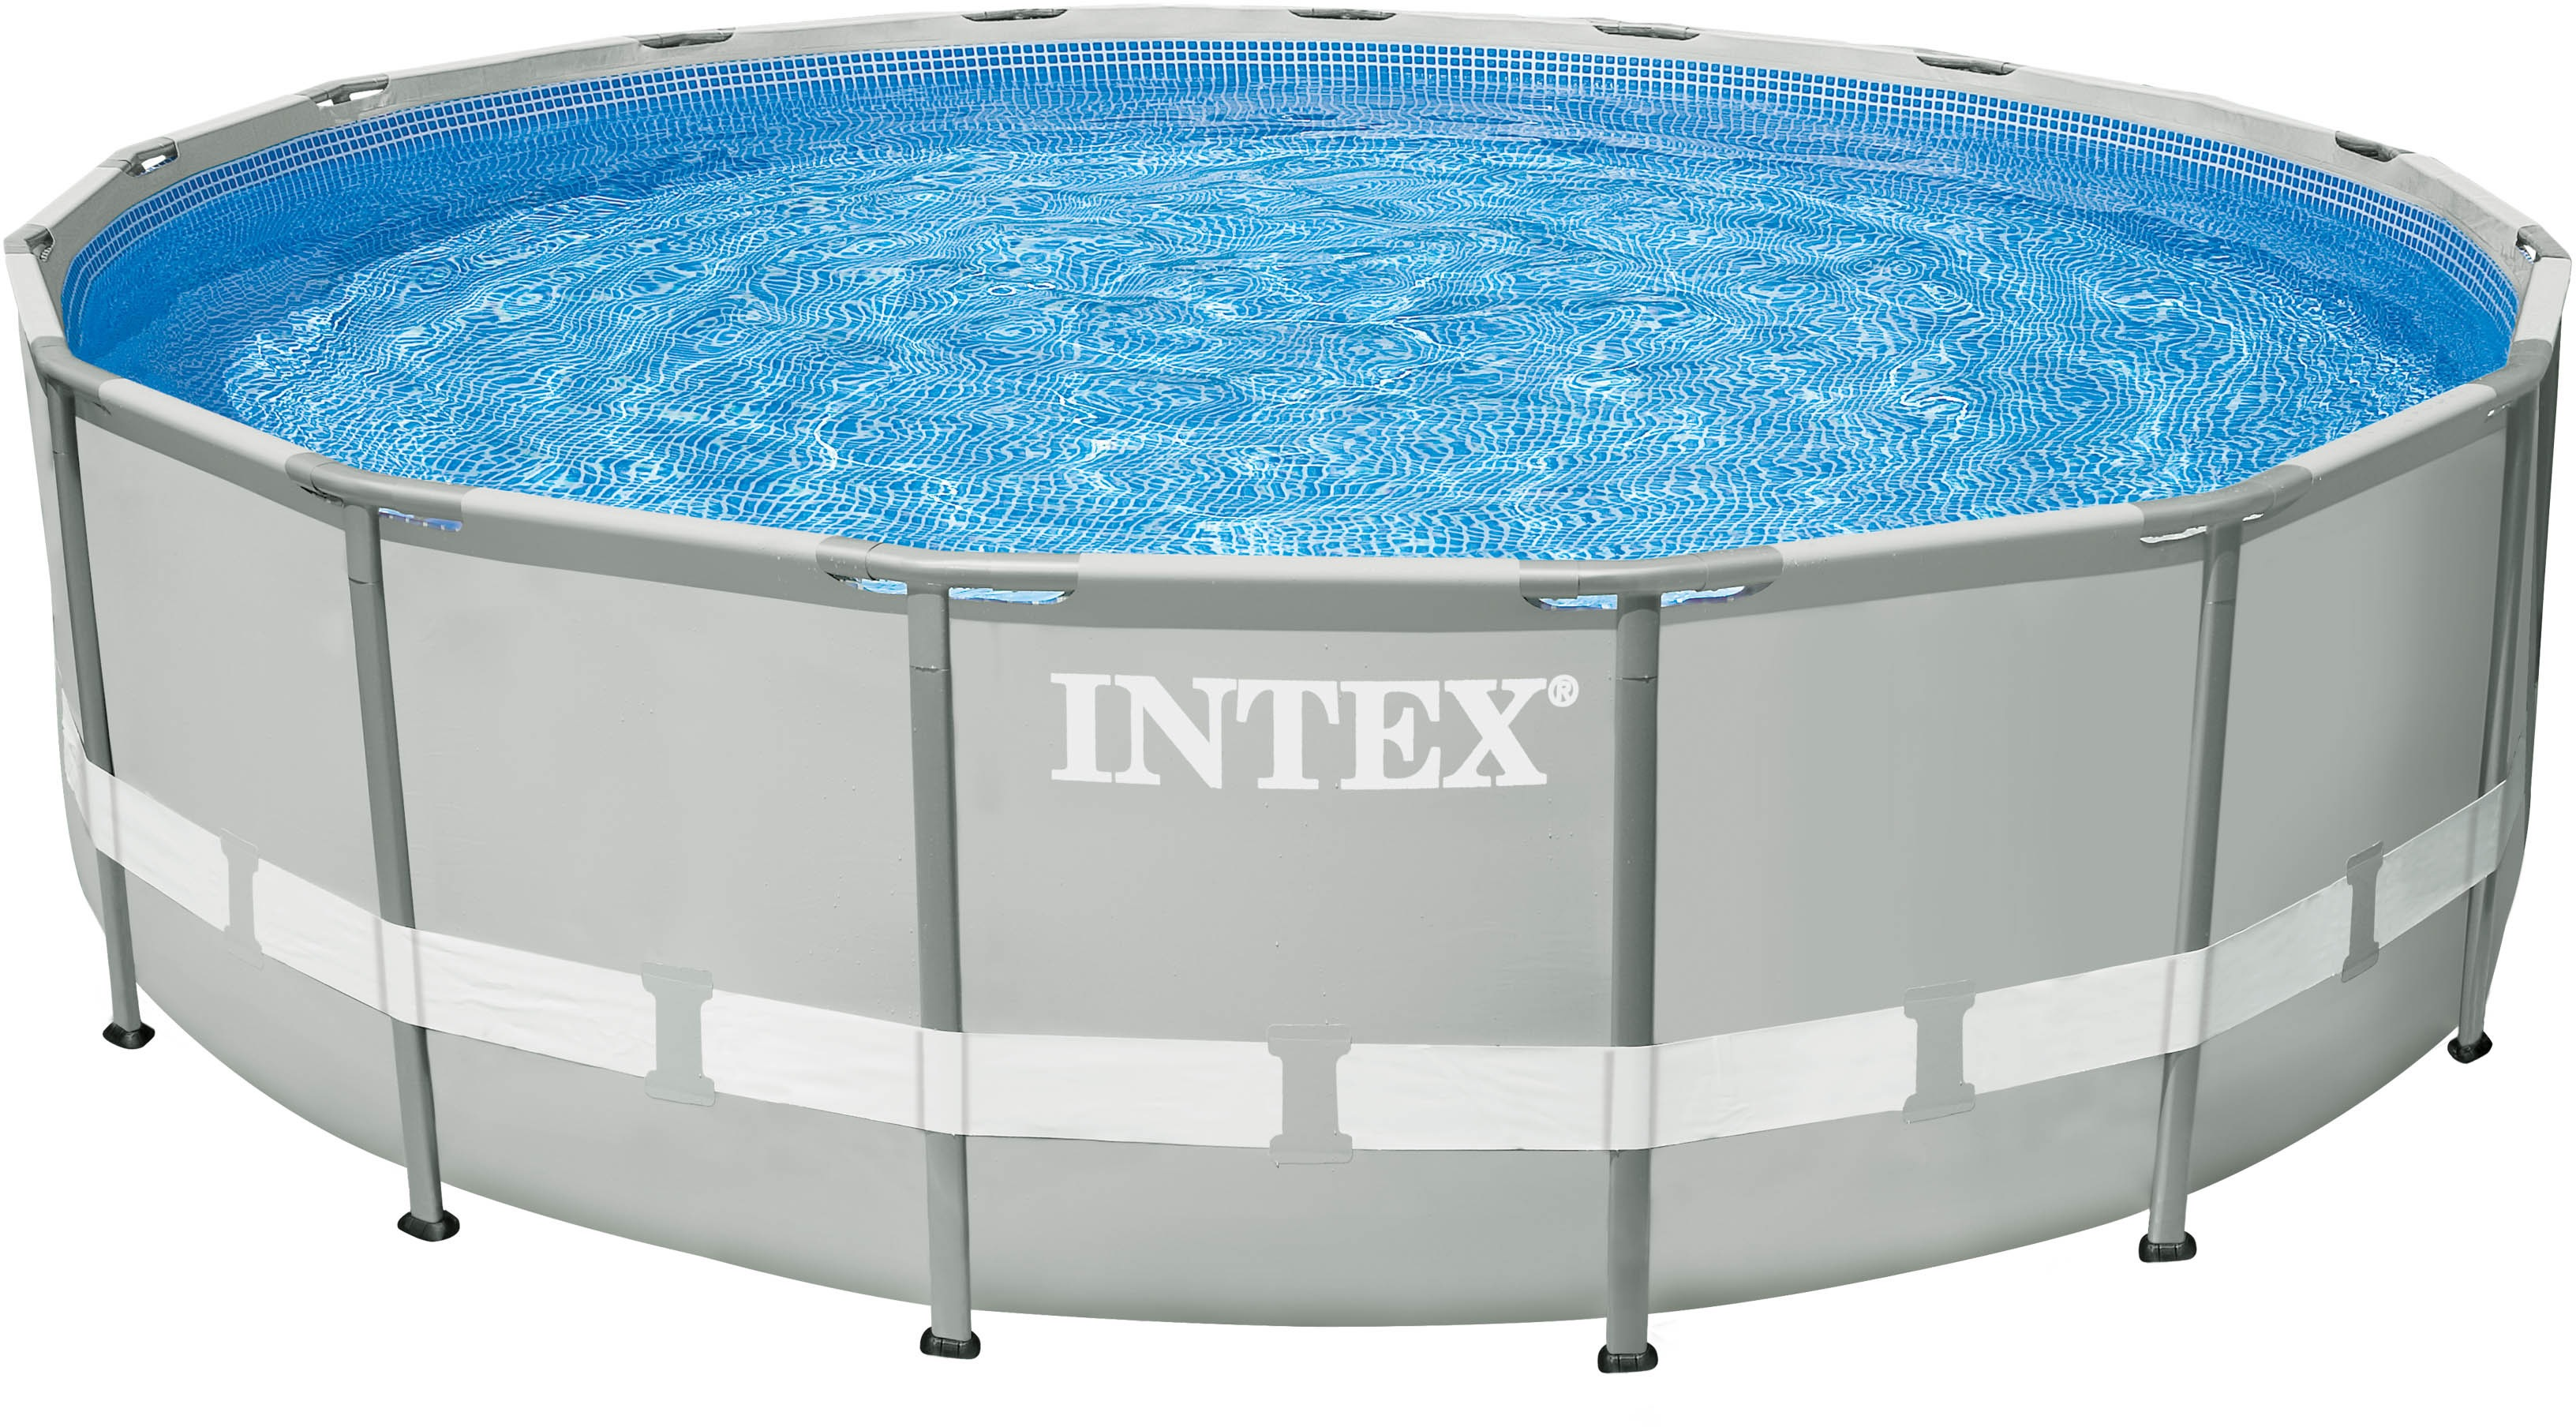 Intex Pool-Set, mit Kartuschenfilteranlage, Ø 488 cm, »Frame Pool Ultra Komplett-Set« | Garten > Swimmingpools > Filteranlagen | Grau | INTEX